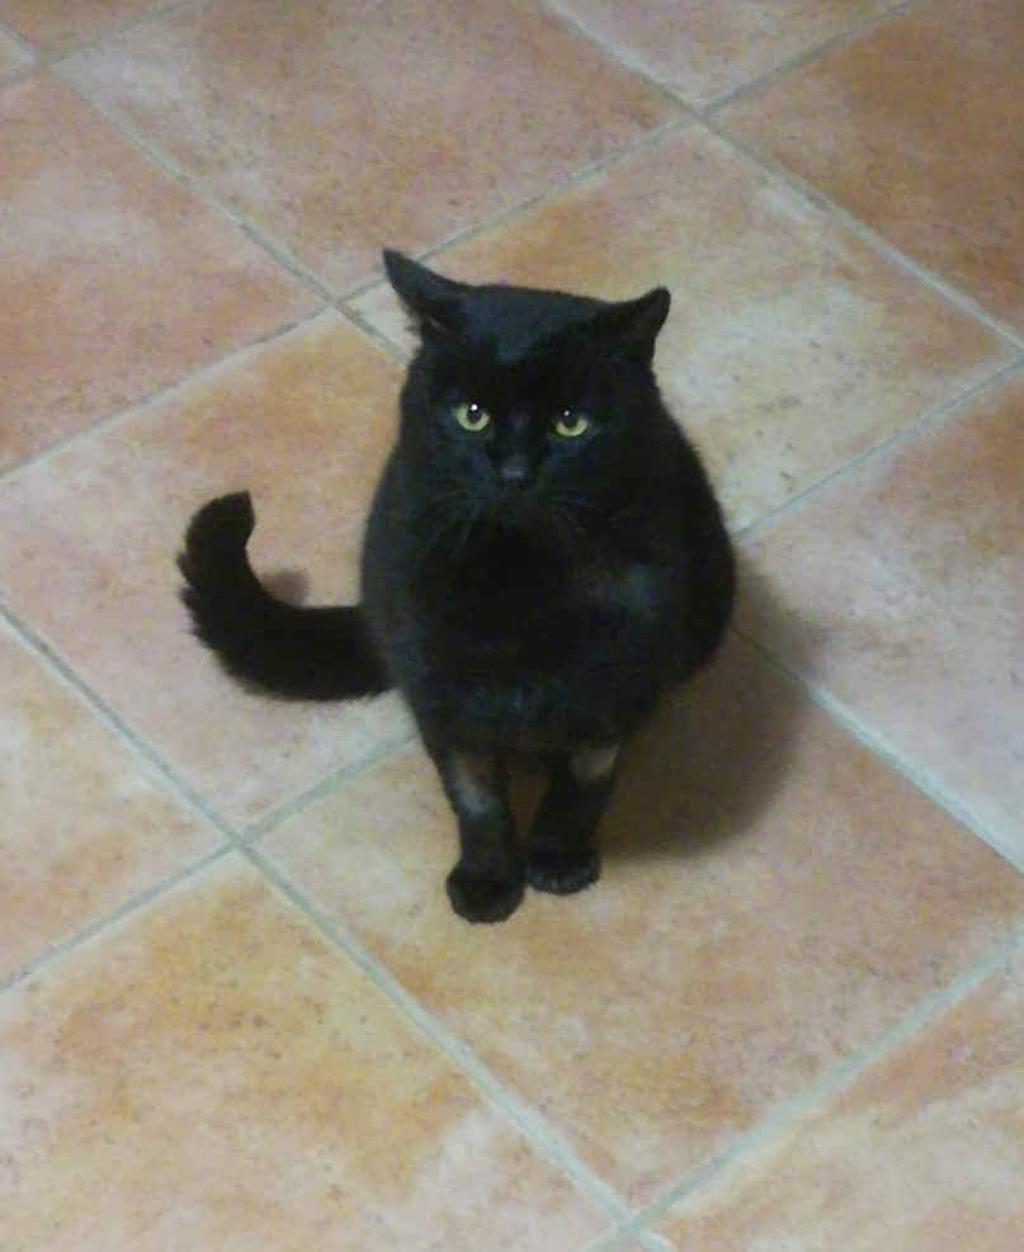 gatto-nero-su-pavimento